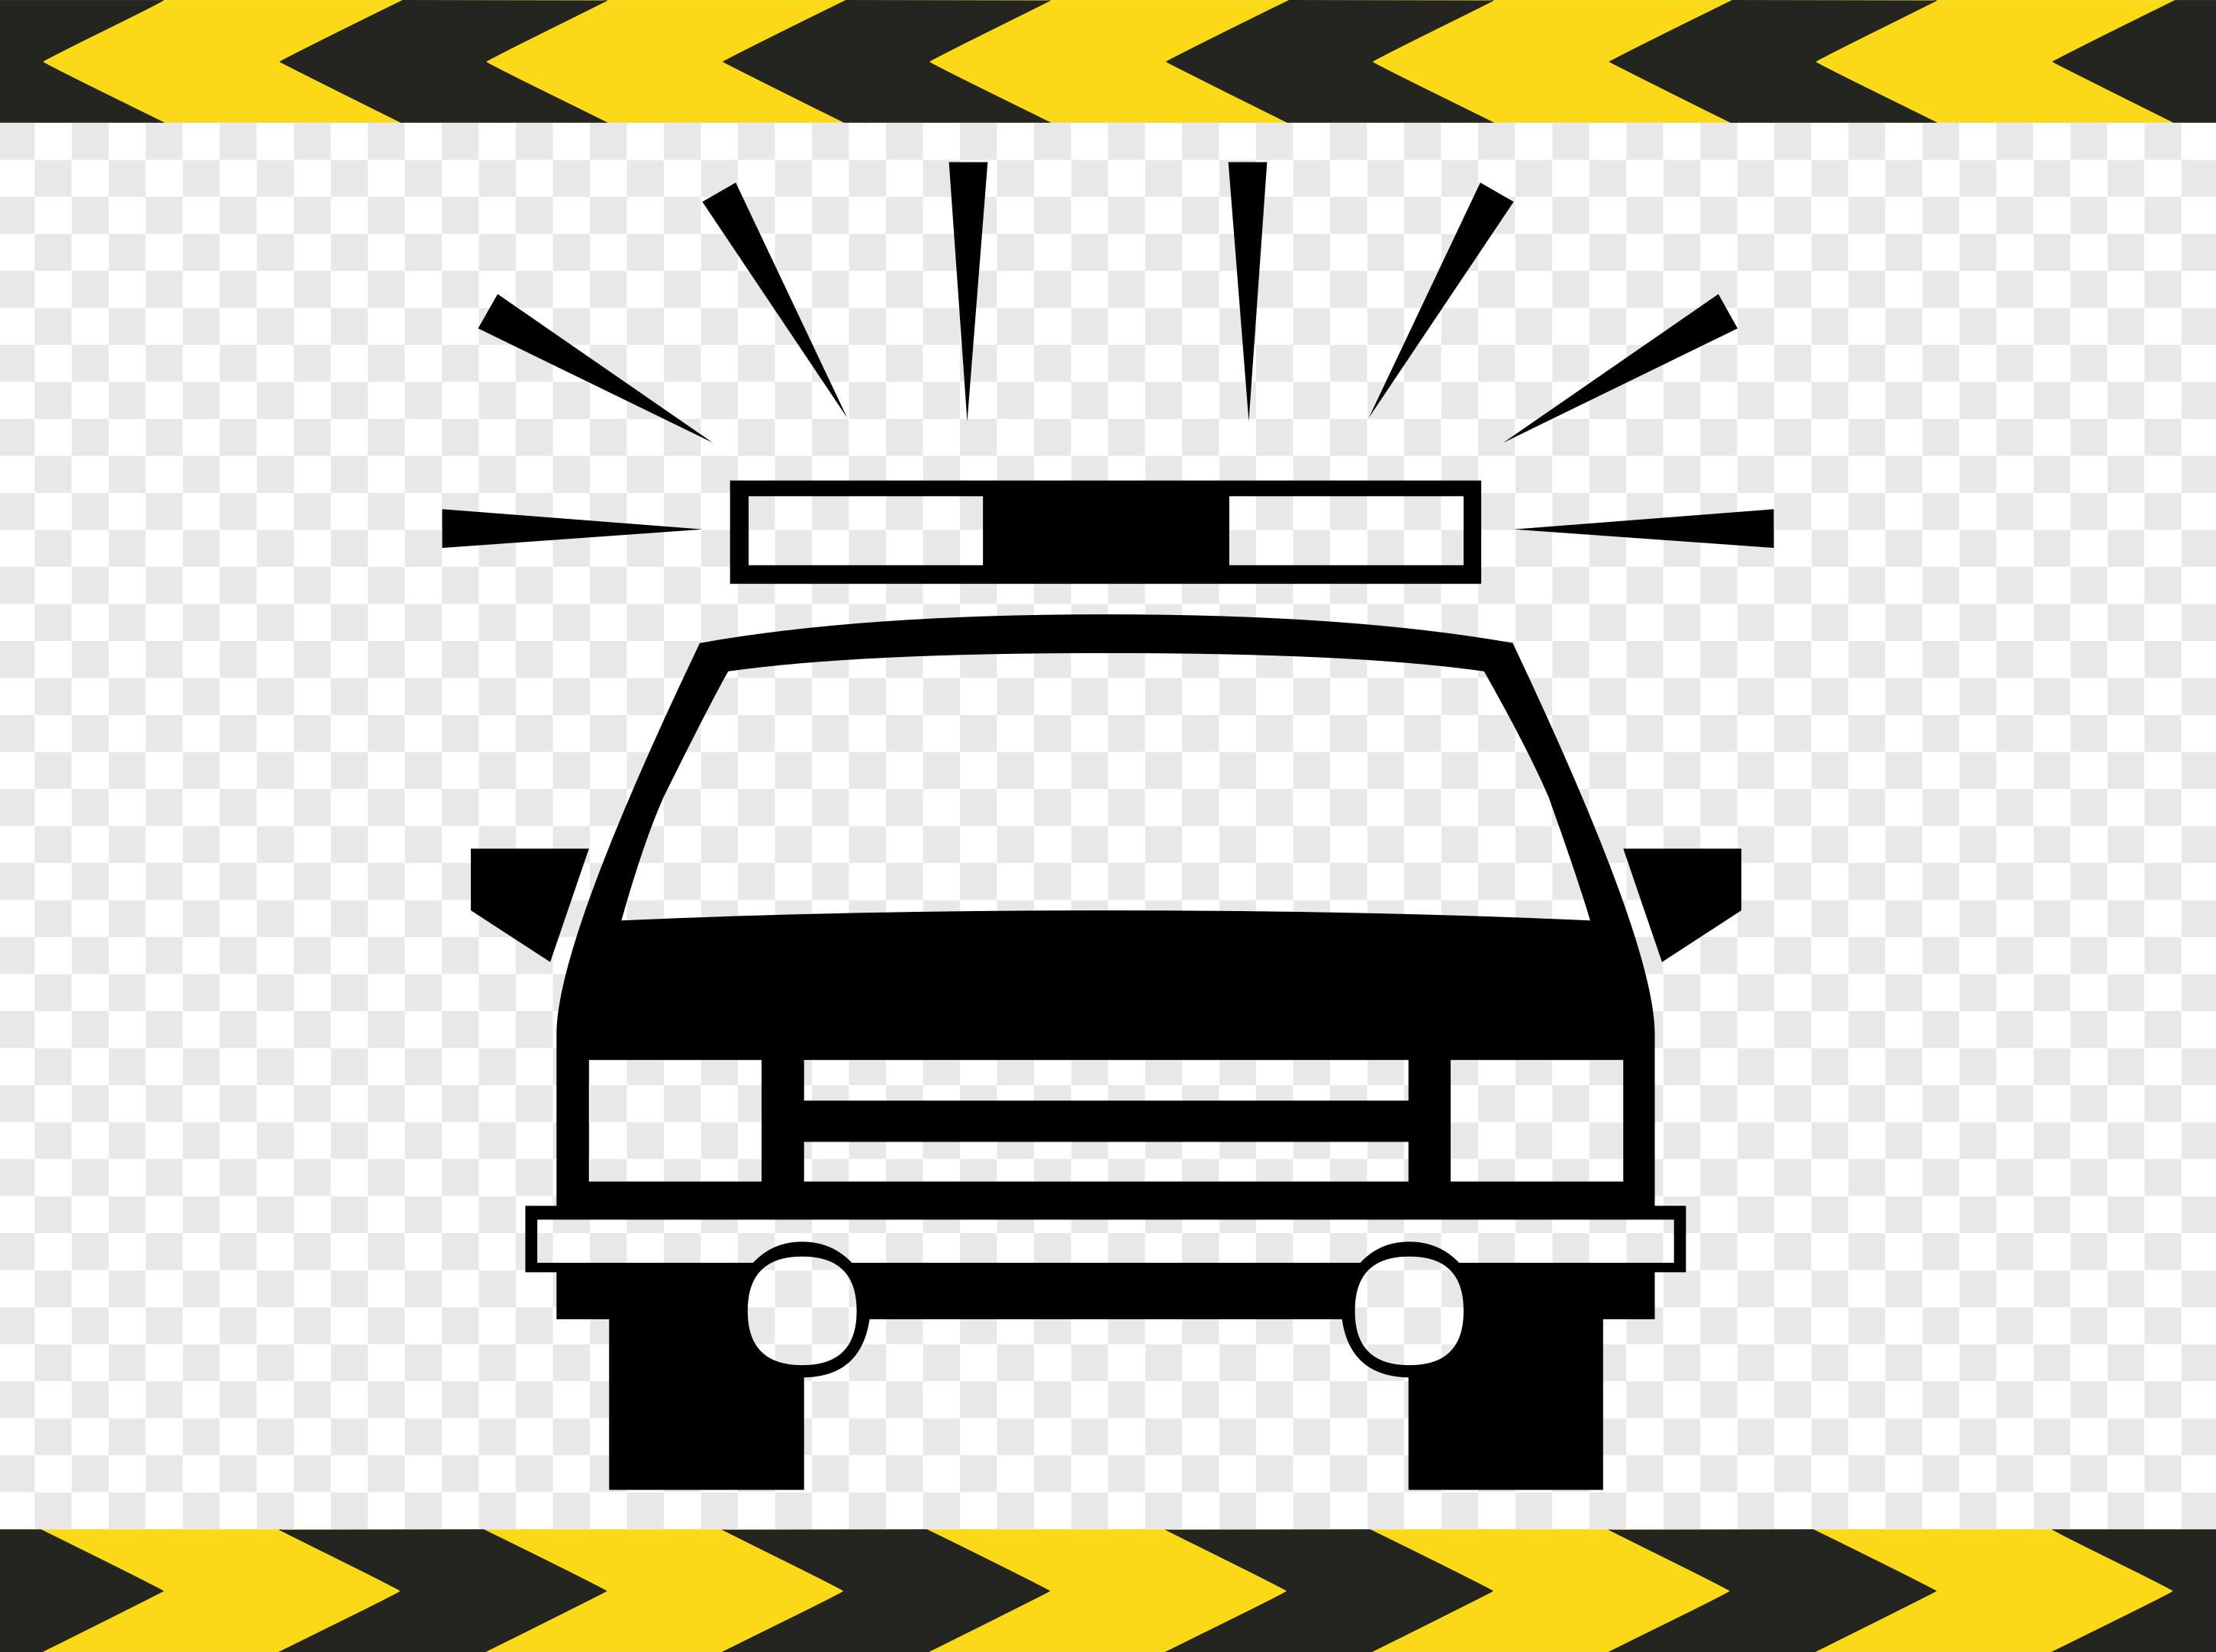 Polizeiauto SVG Clipart kommerziellen Cricut Designs Downloads